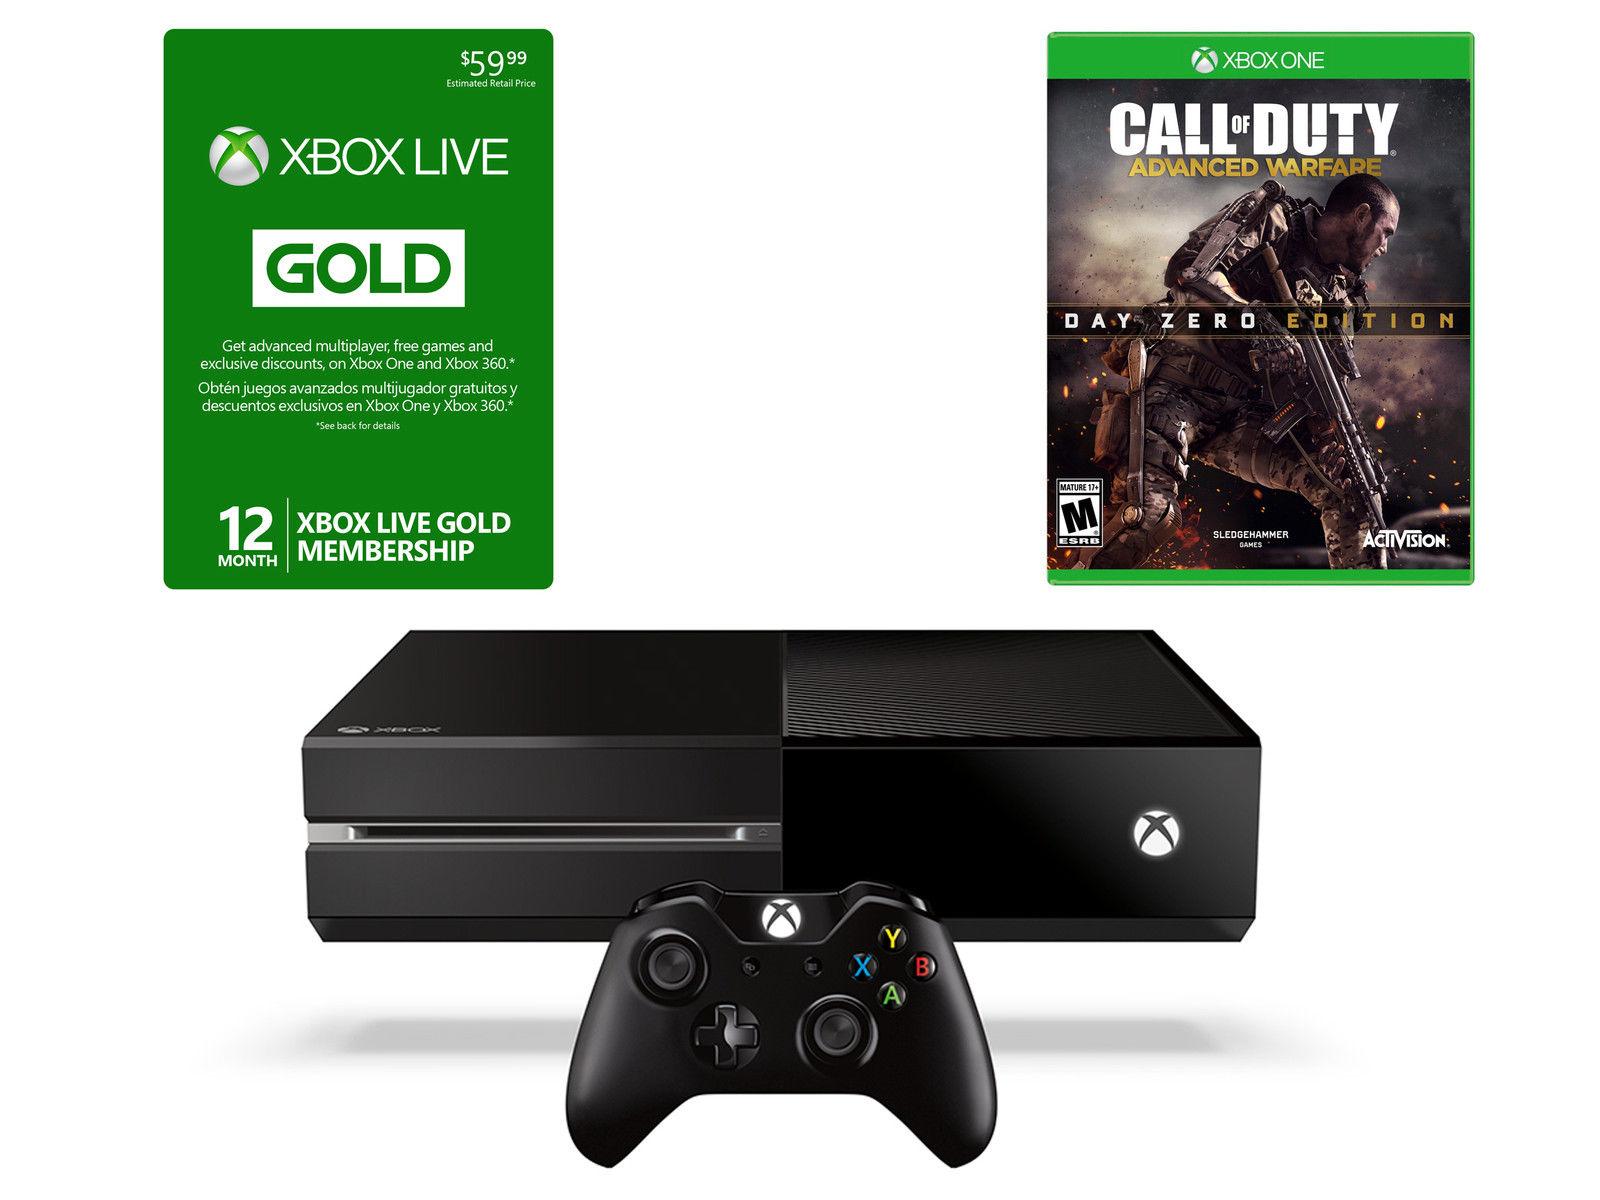 Xbox One Call of Duty Advanced Warfare Bundle Sale $379.99 ...